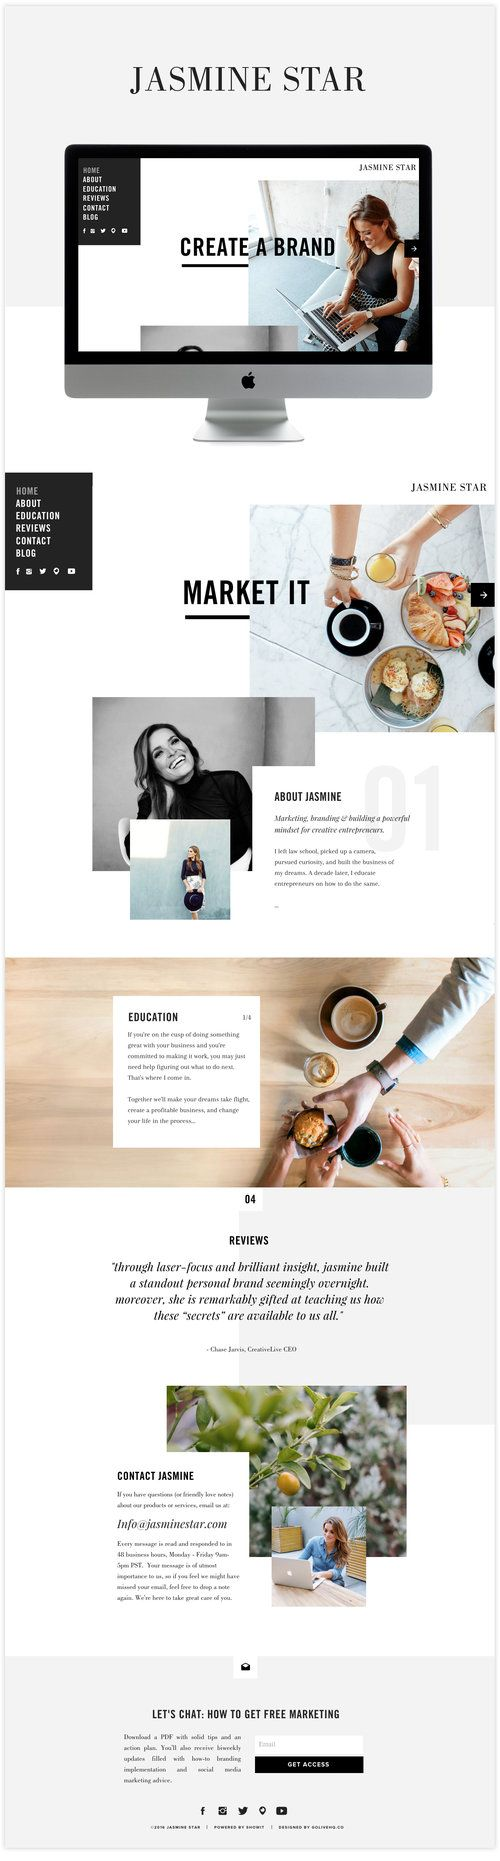 edgy website inspiration showit5 | Web design / ux ui | Pinterest ...